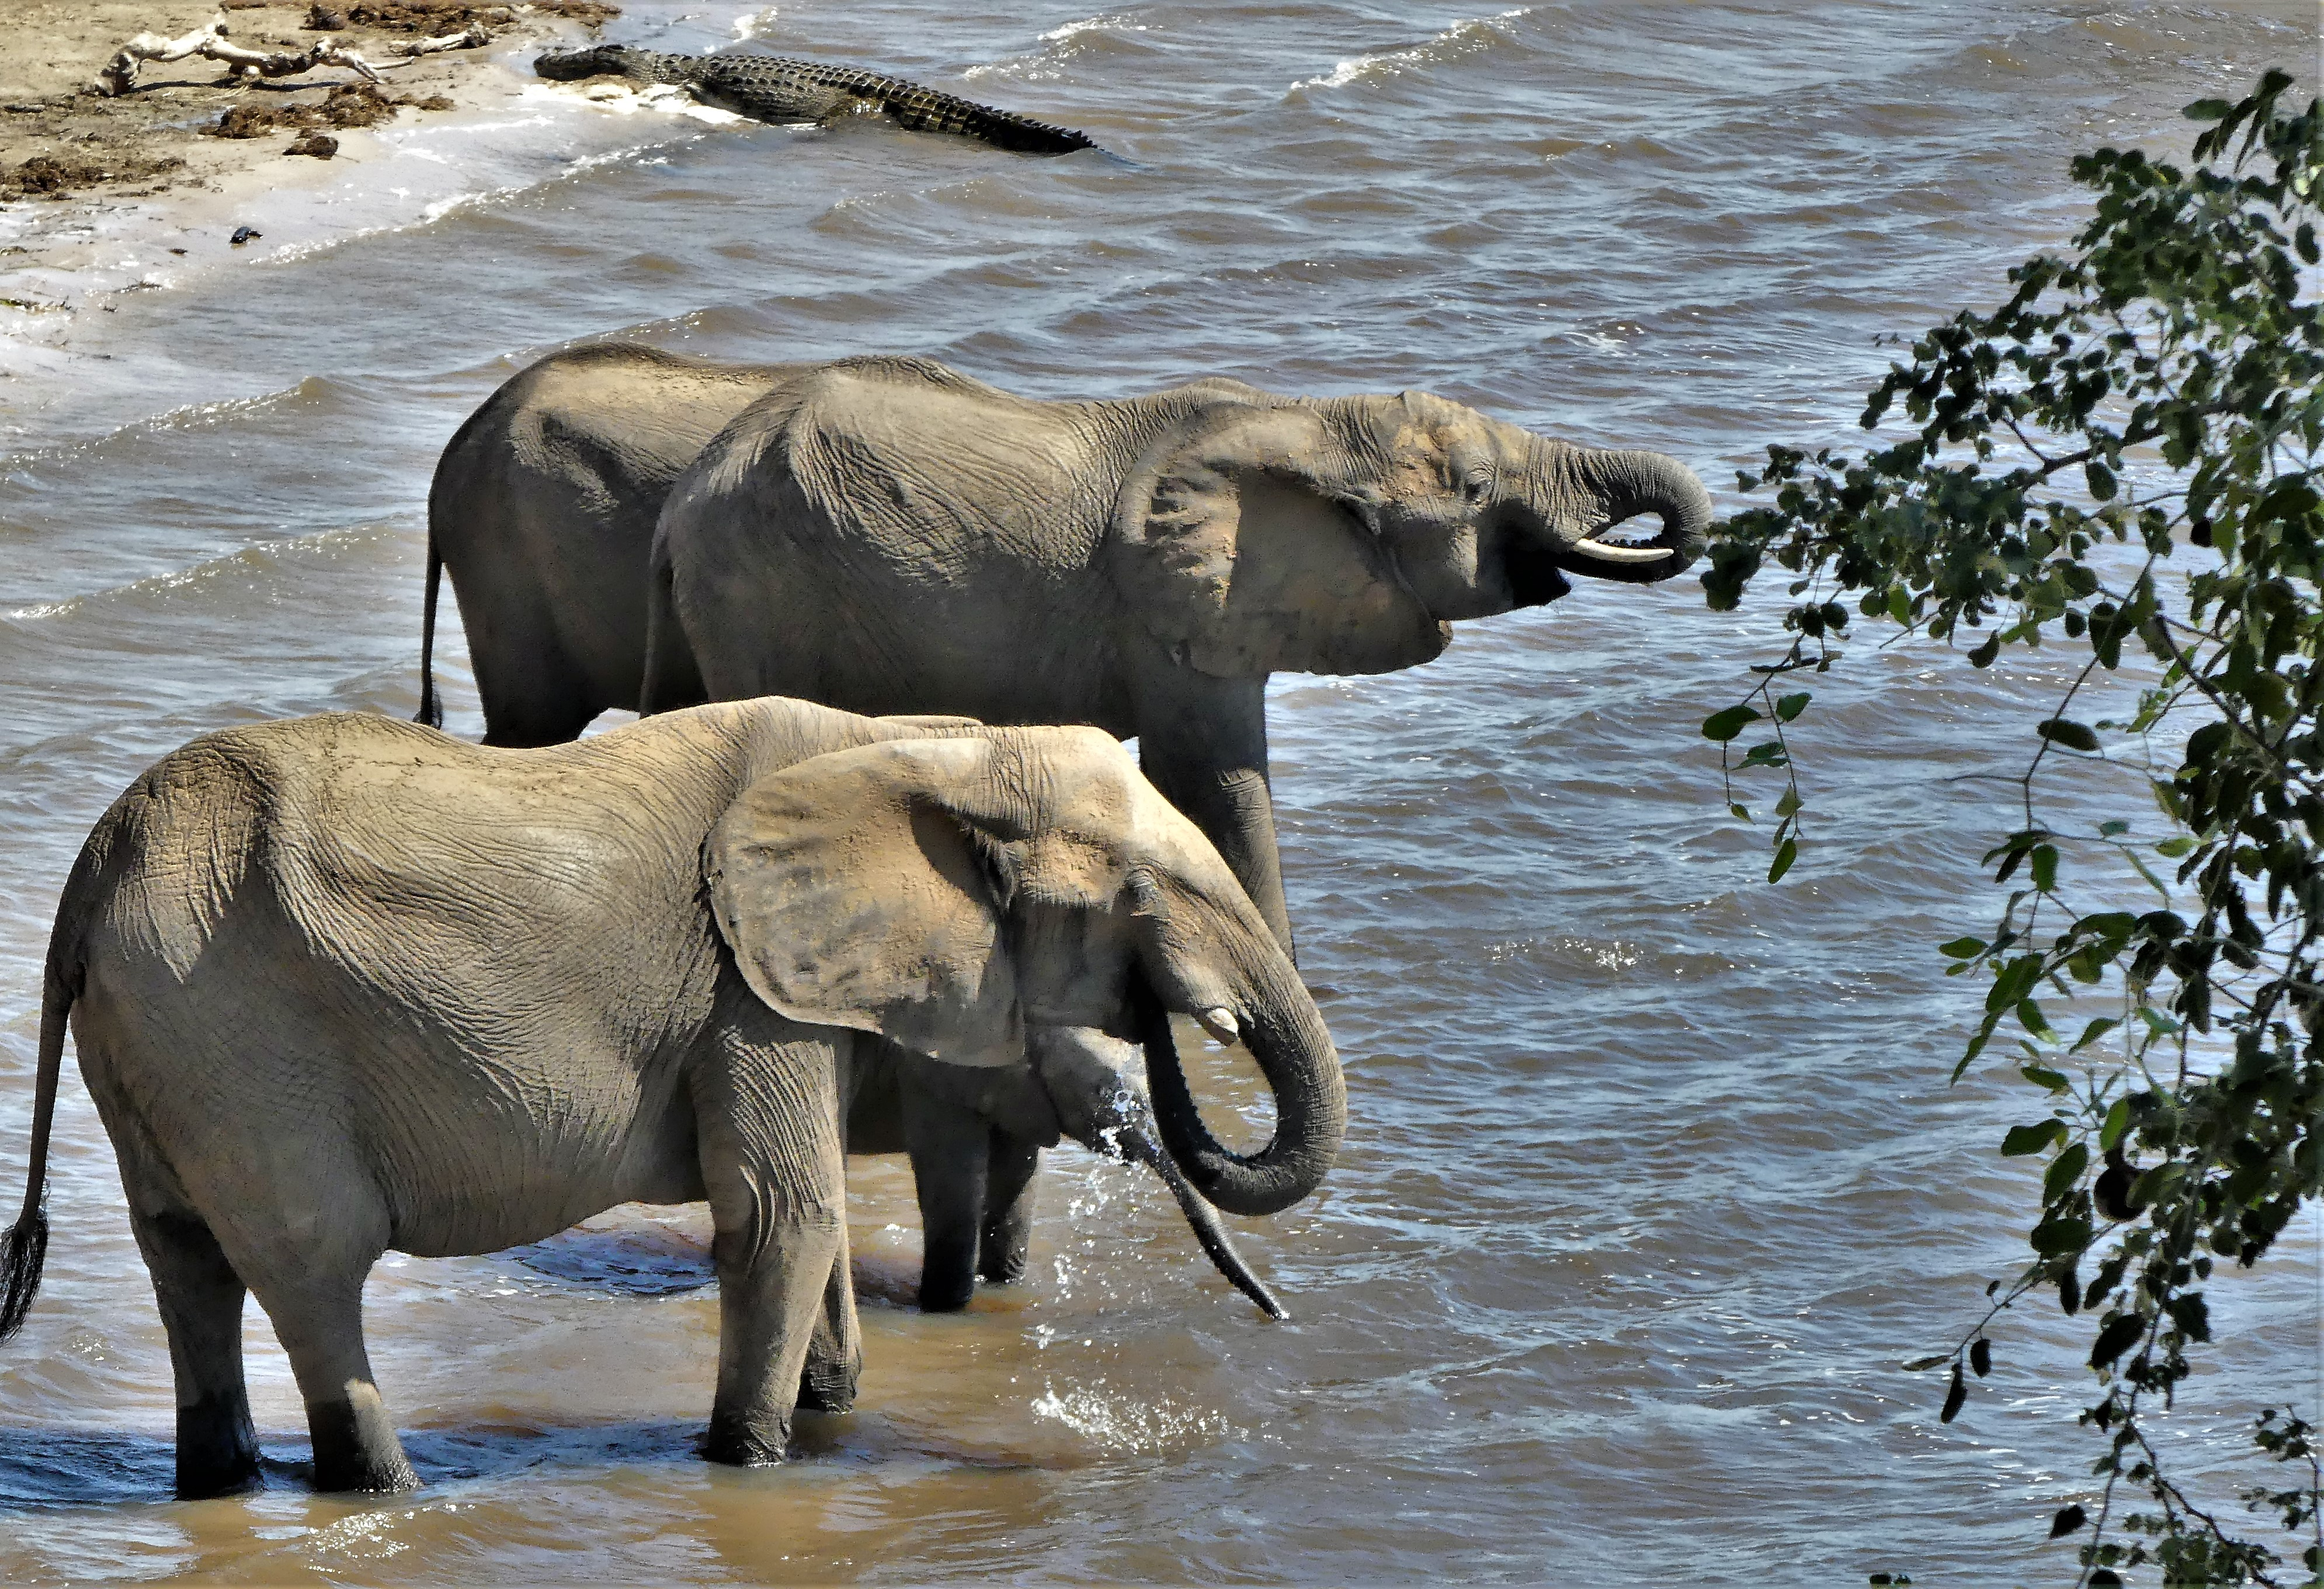 elephants and croc